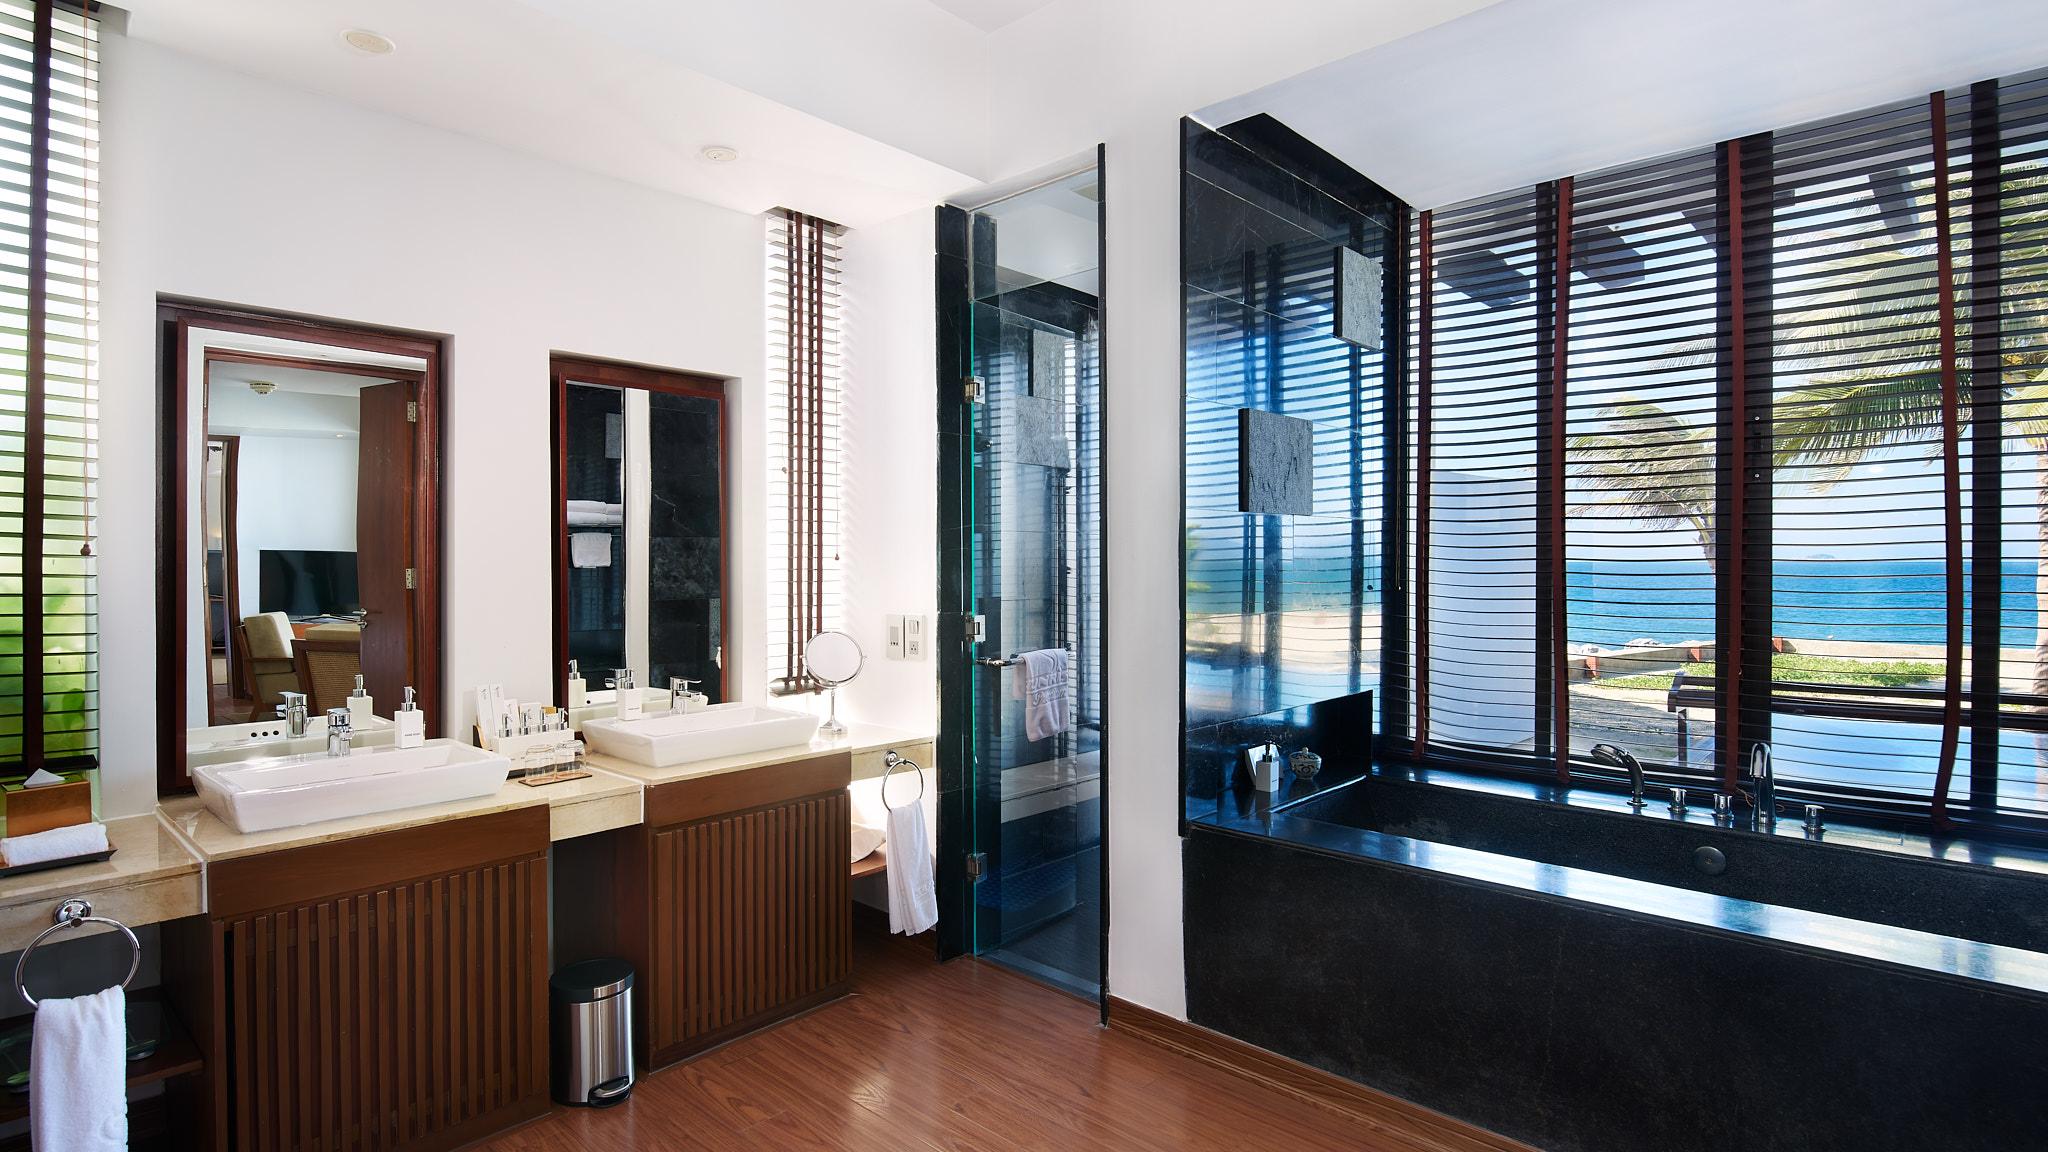 0117_Sunrise Hoi An_Black Bathroom 02.jpg